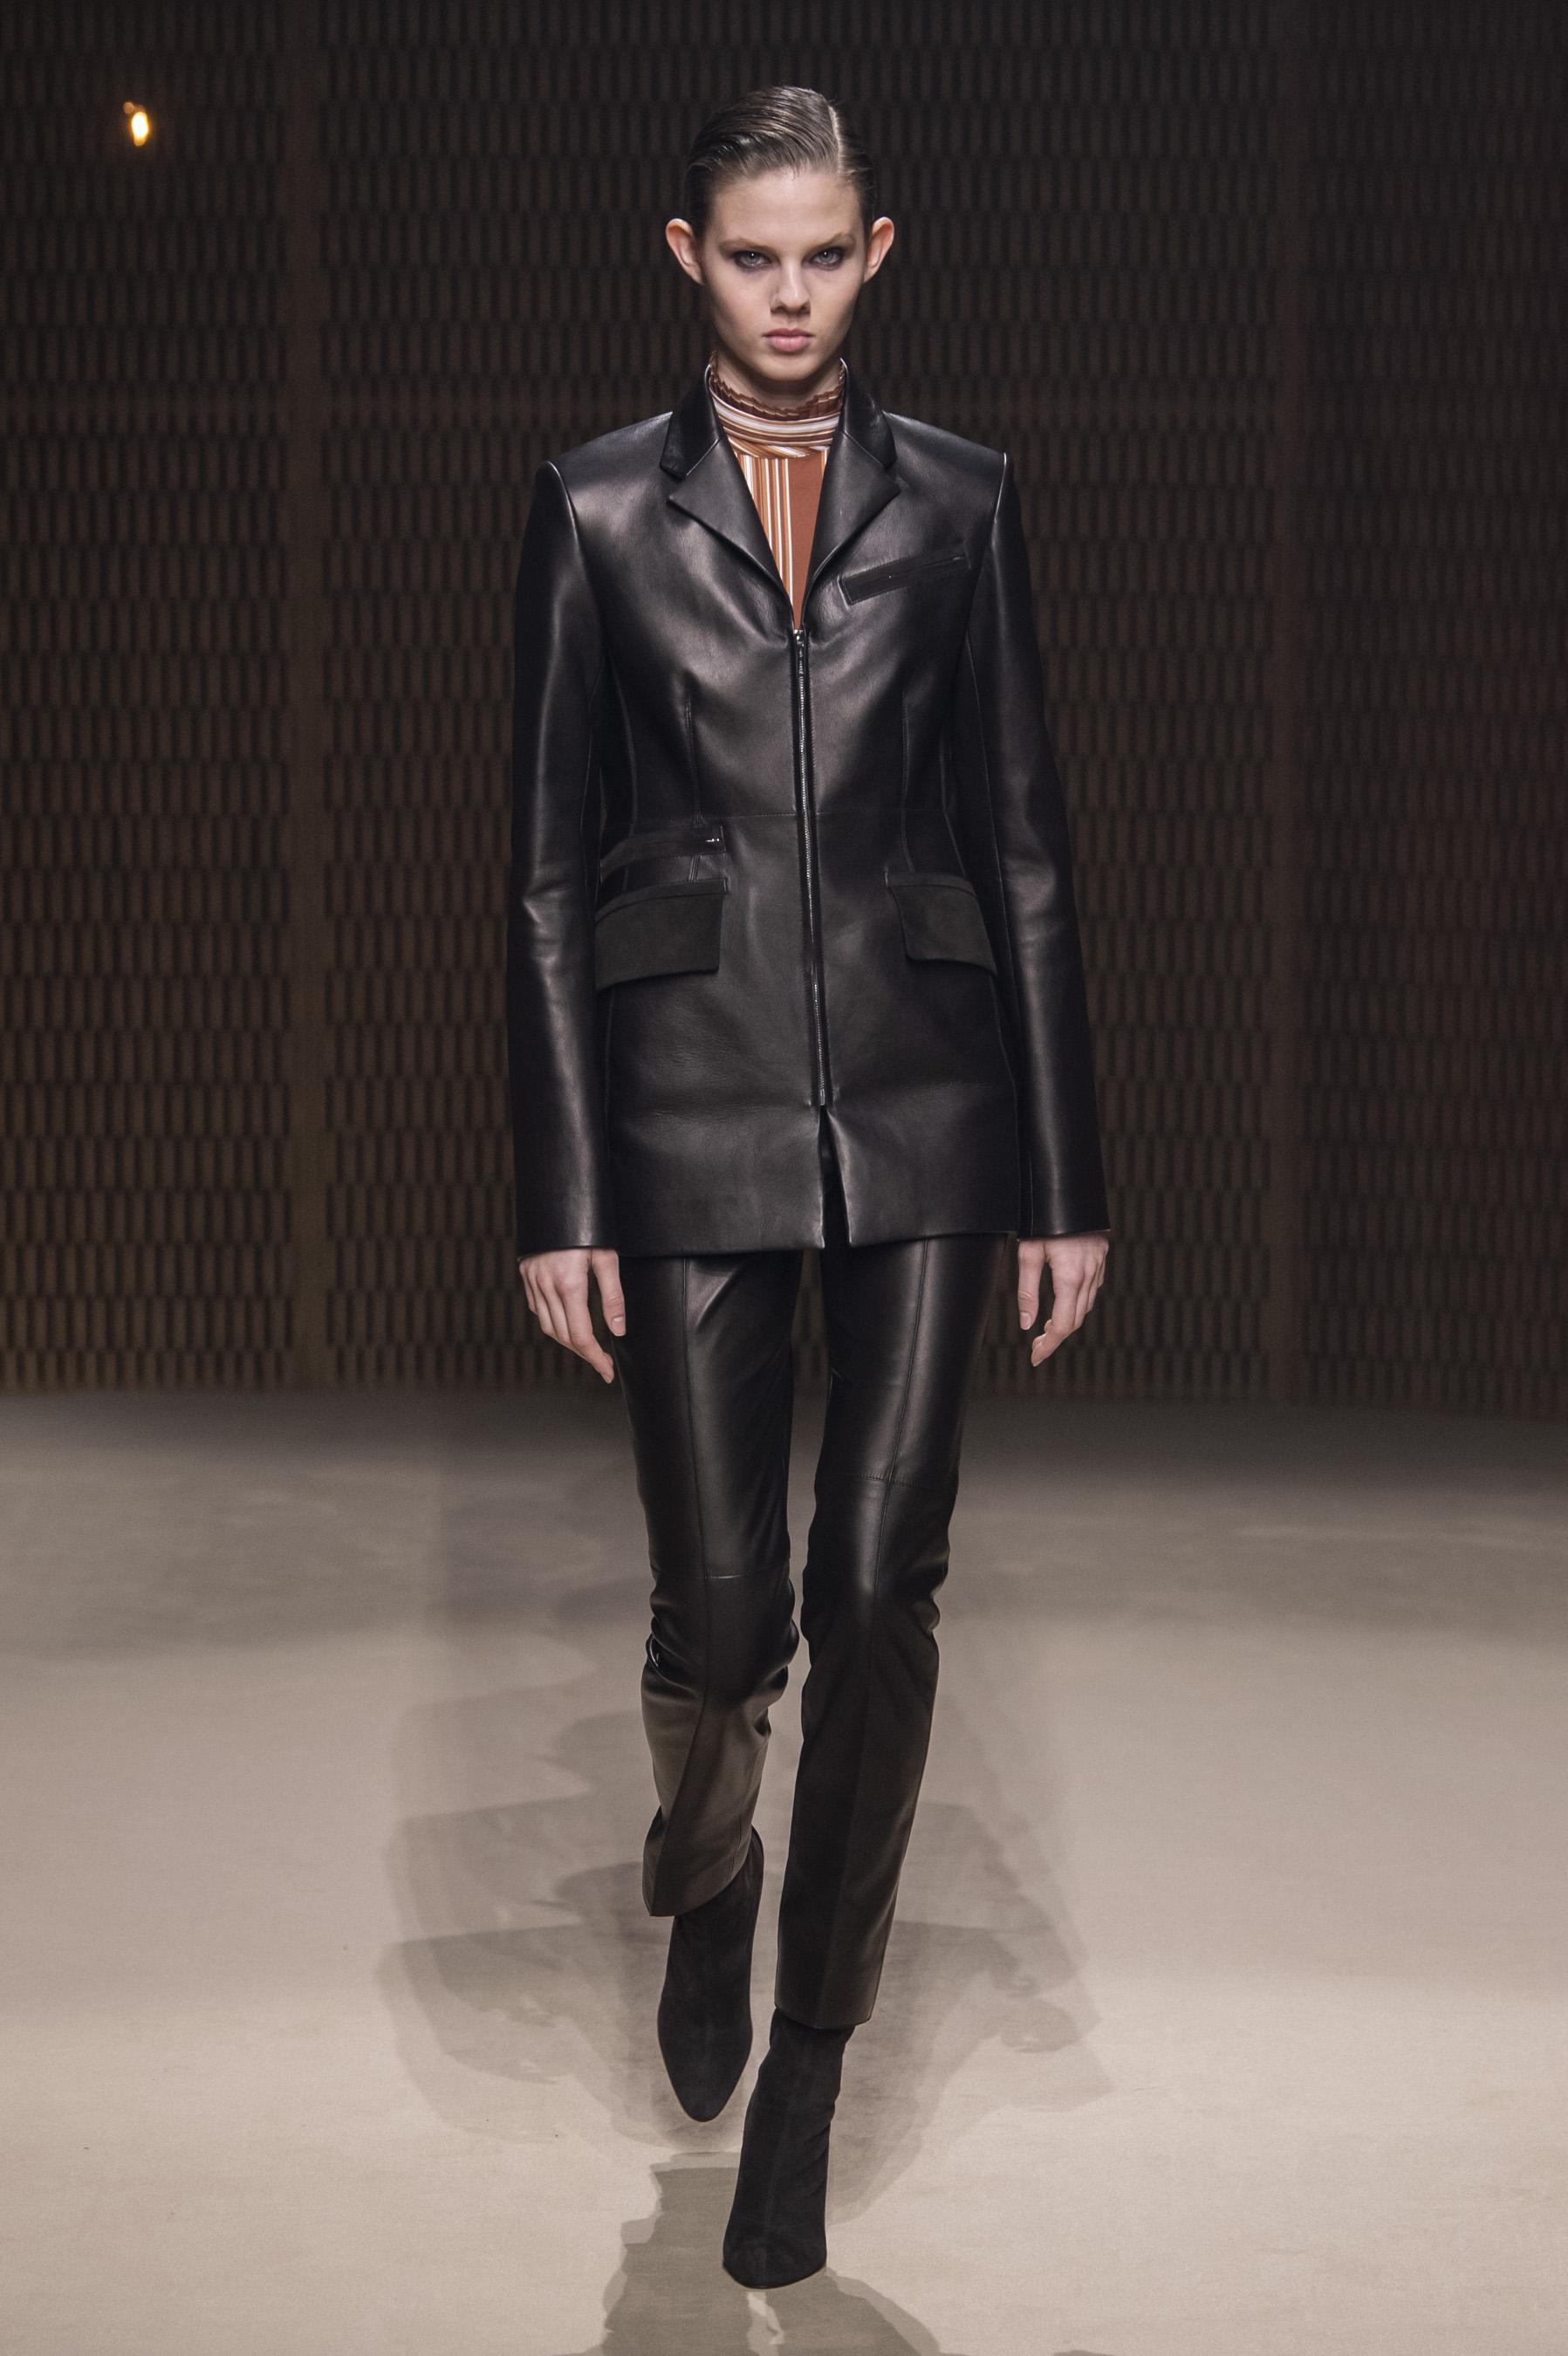 96ca6f8a43b Défilé Hermès automne-hiver 2019-2020 Prêt-à-porter - Madame Figaro